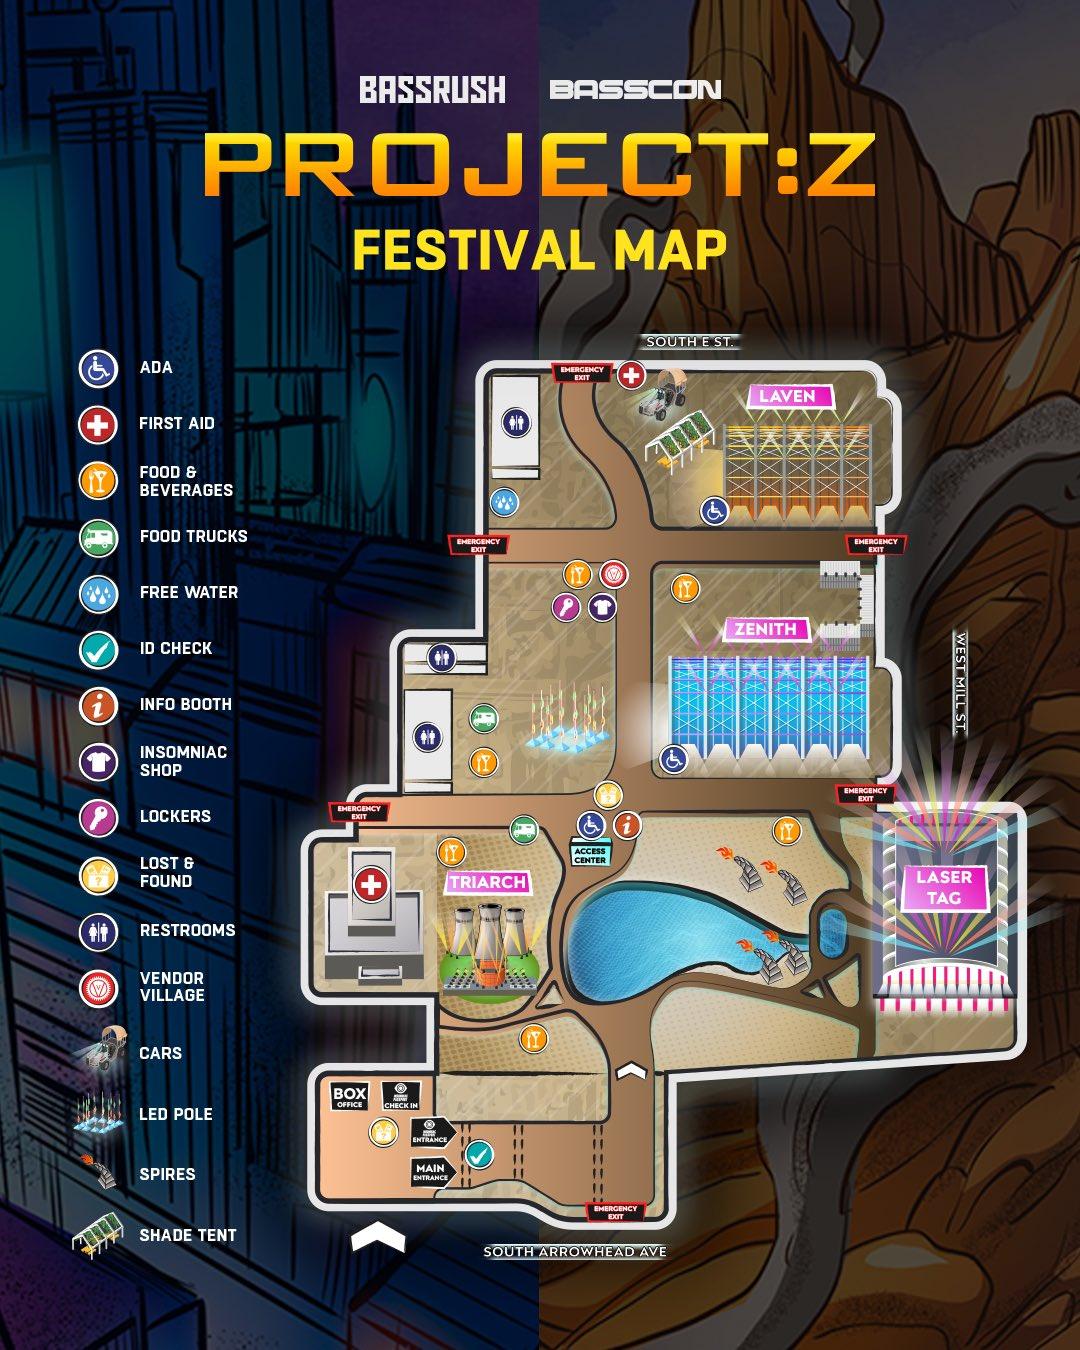 Project Z 2019 Festival Map